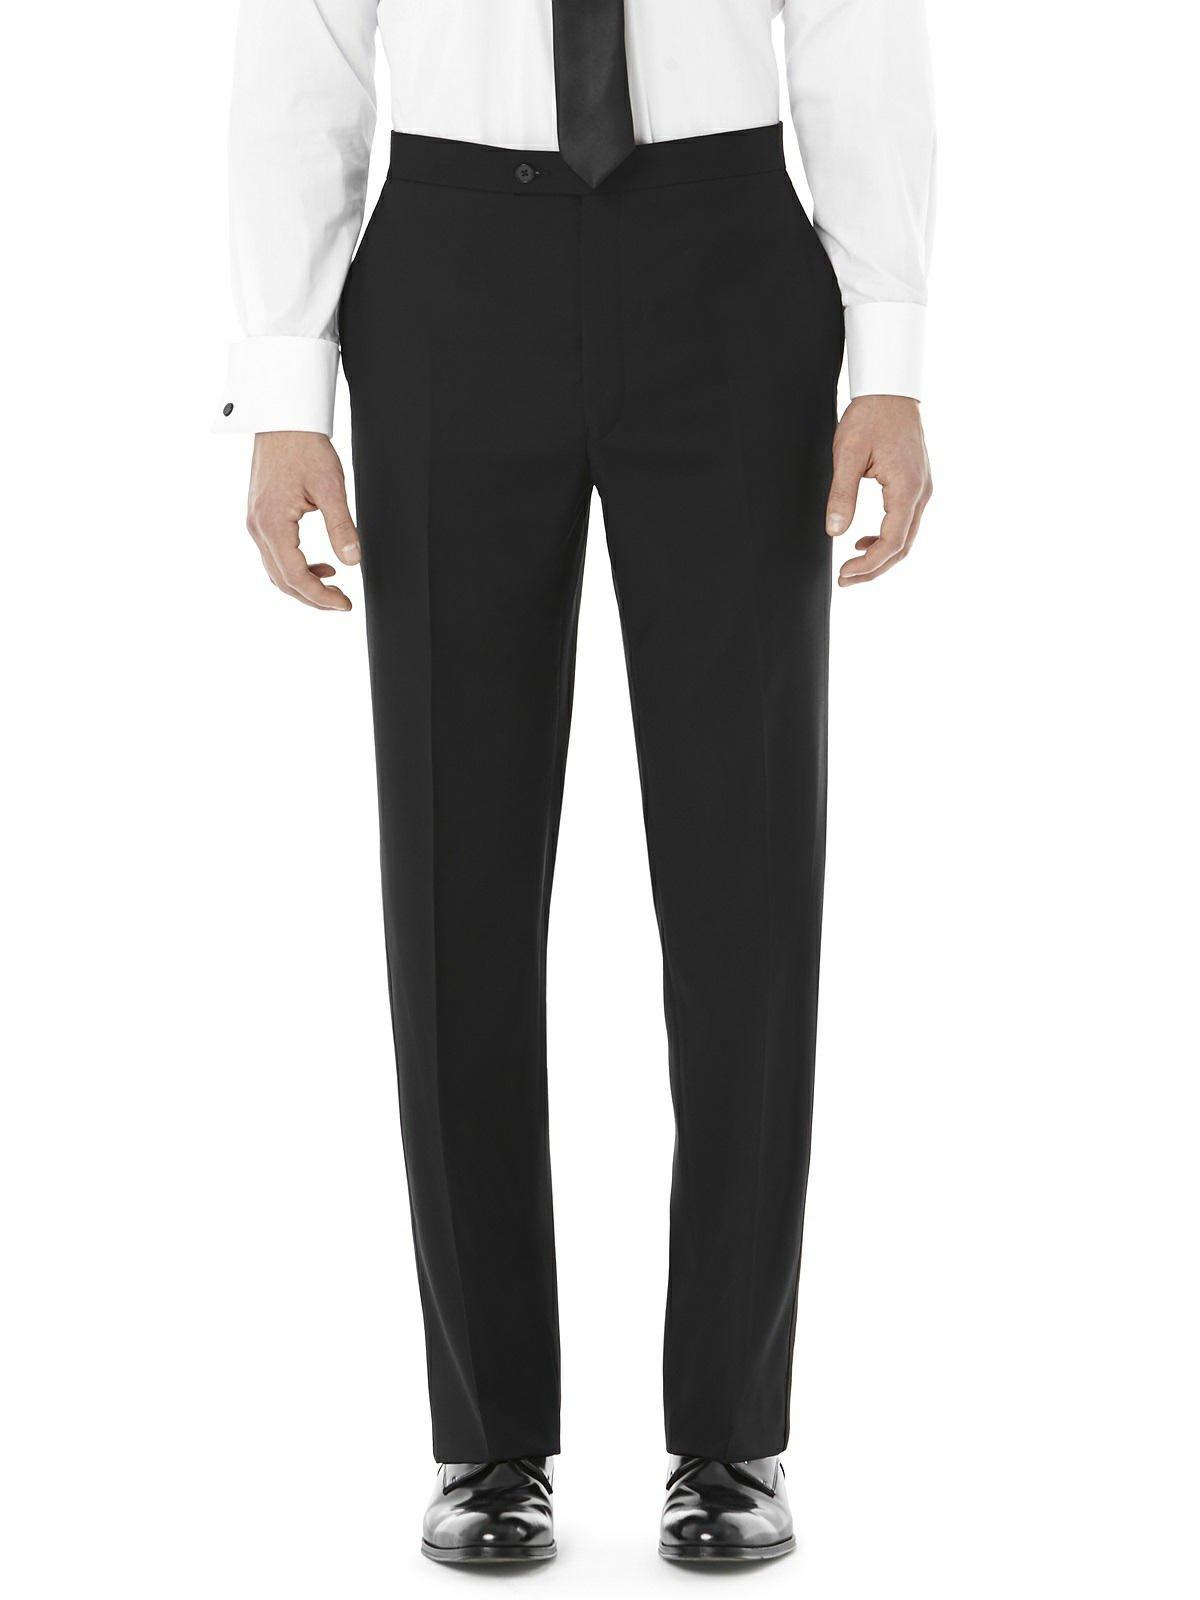 Men's Slim Fit Wool Tuxedo Pants- Dylan by Dessy Group - Black - Size 32/adj